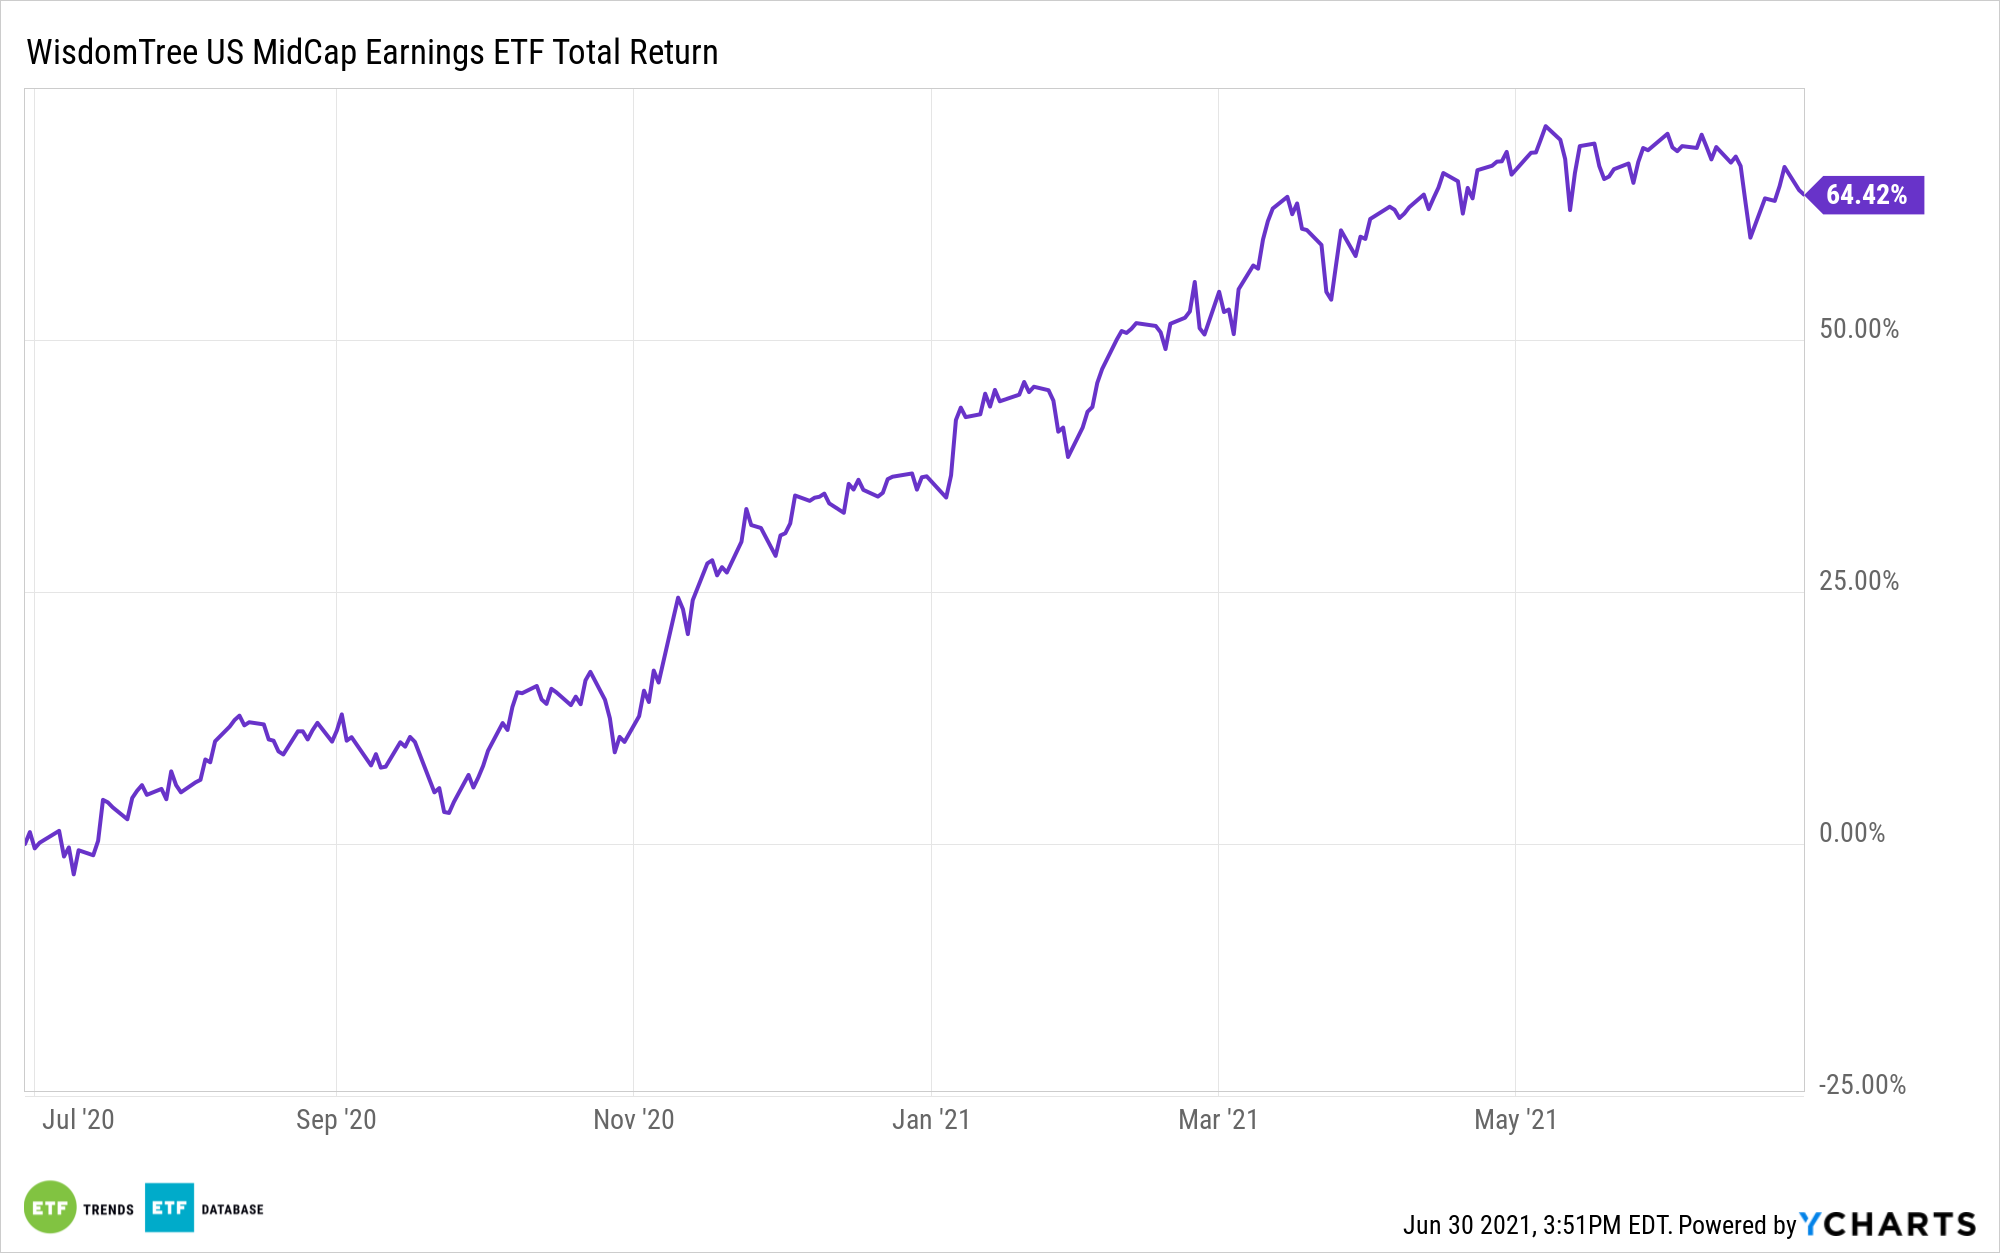 EZM 1 Year Performance